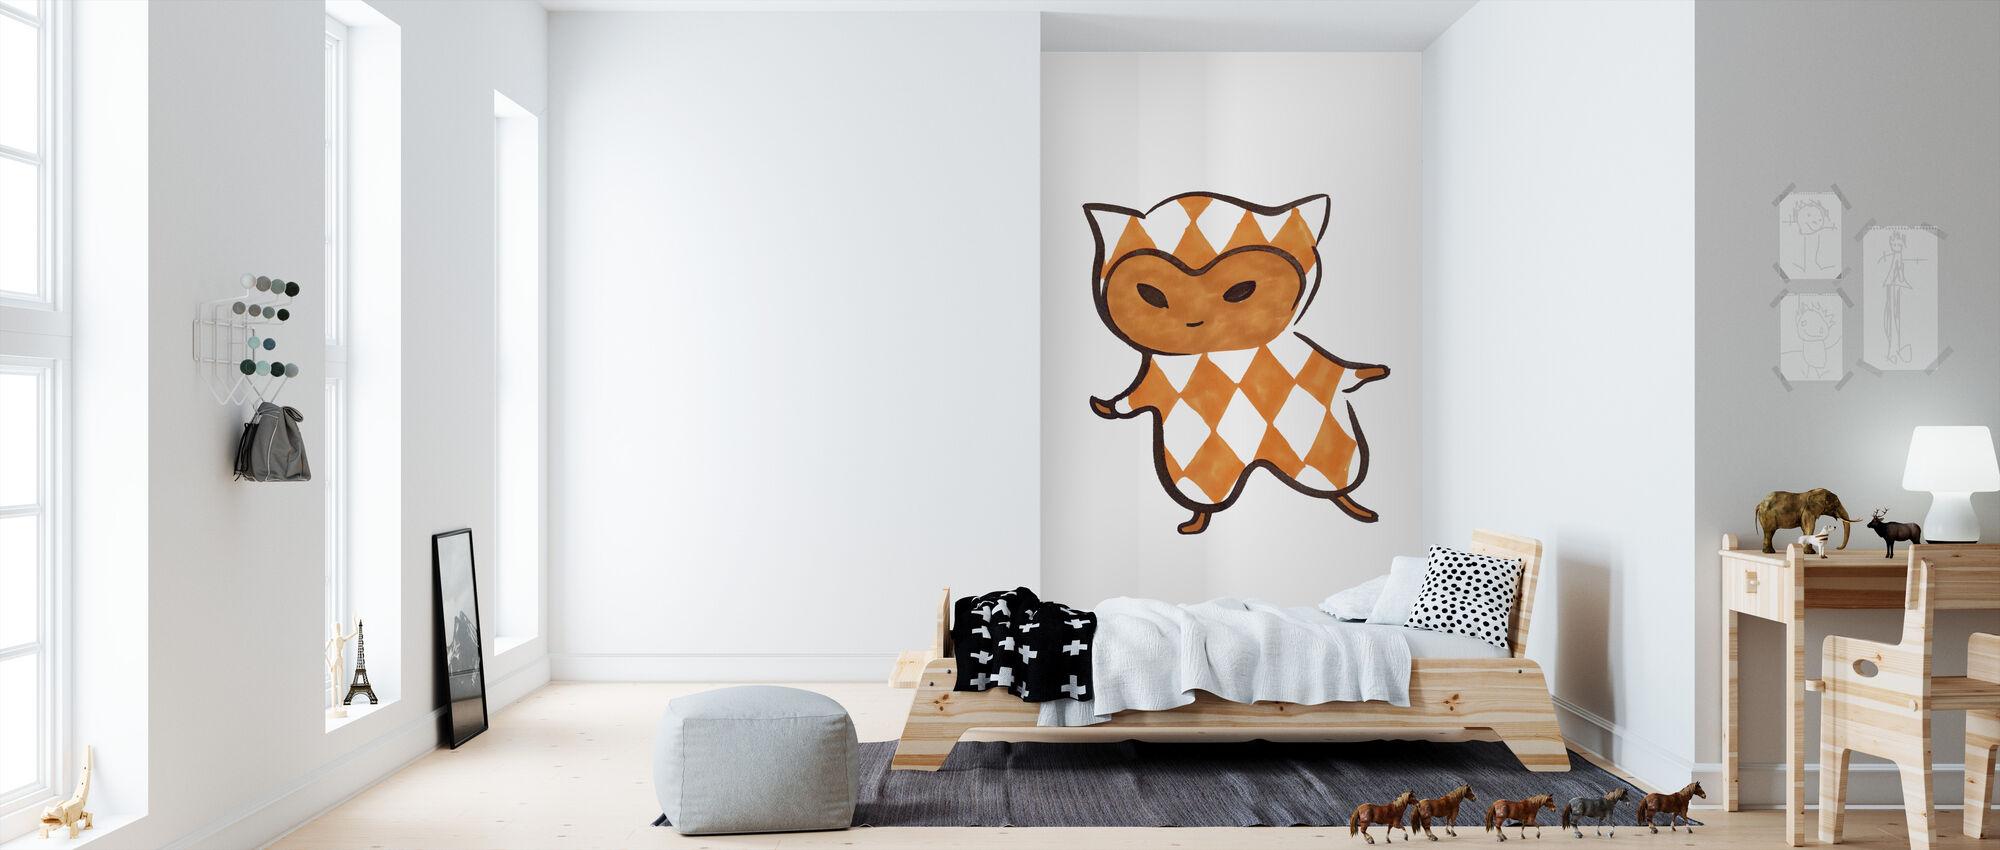 Square - Ruta - Wallpaper - Kids Room